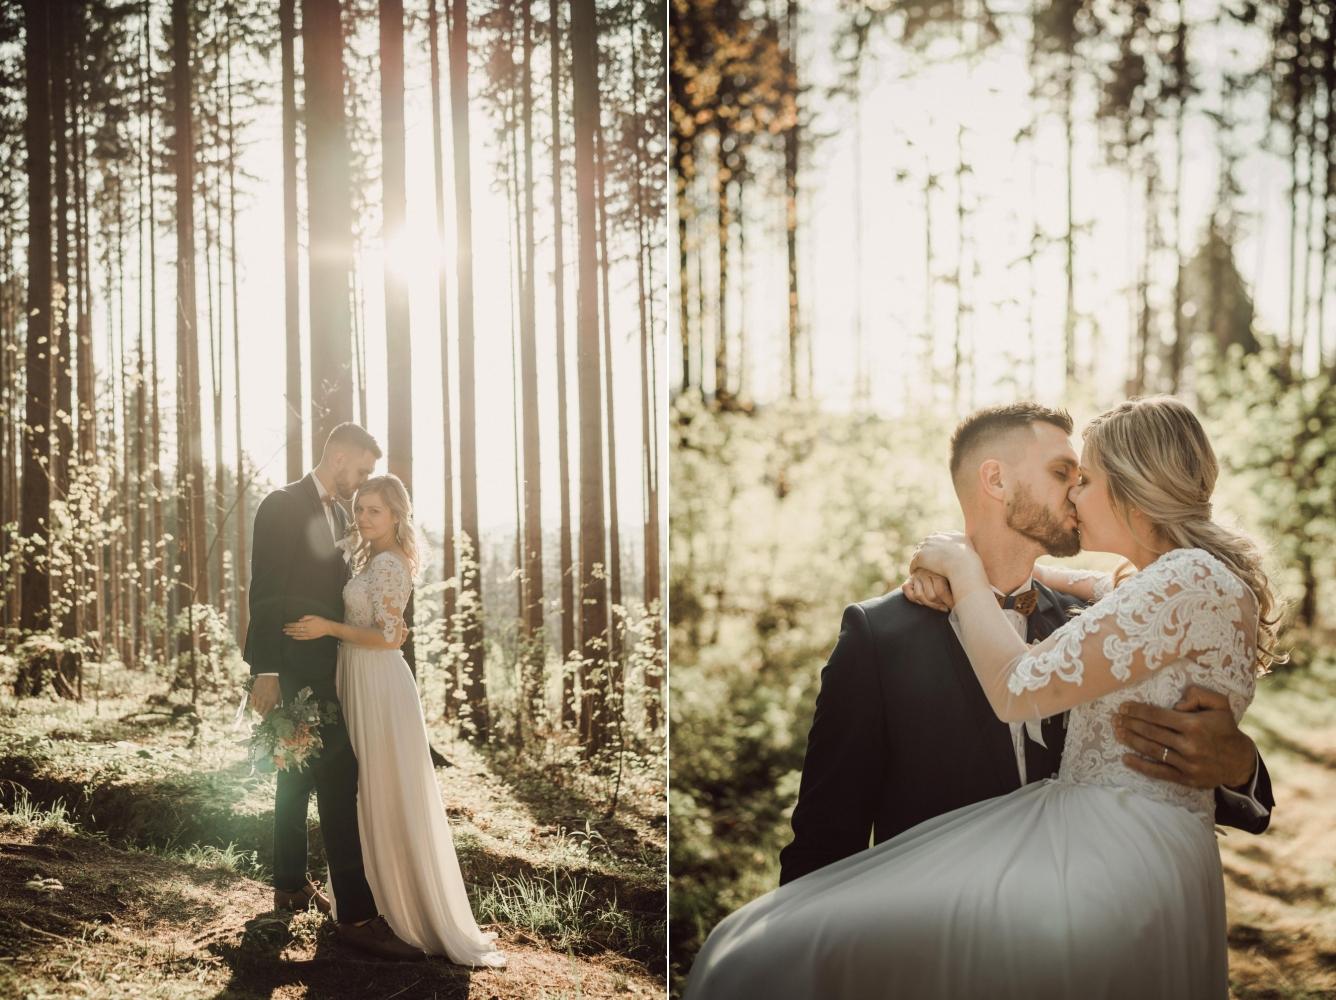 zapad-slnka-fotenie-svadbyjpg